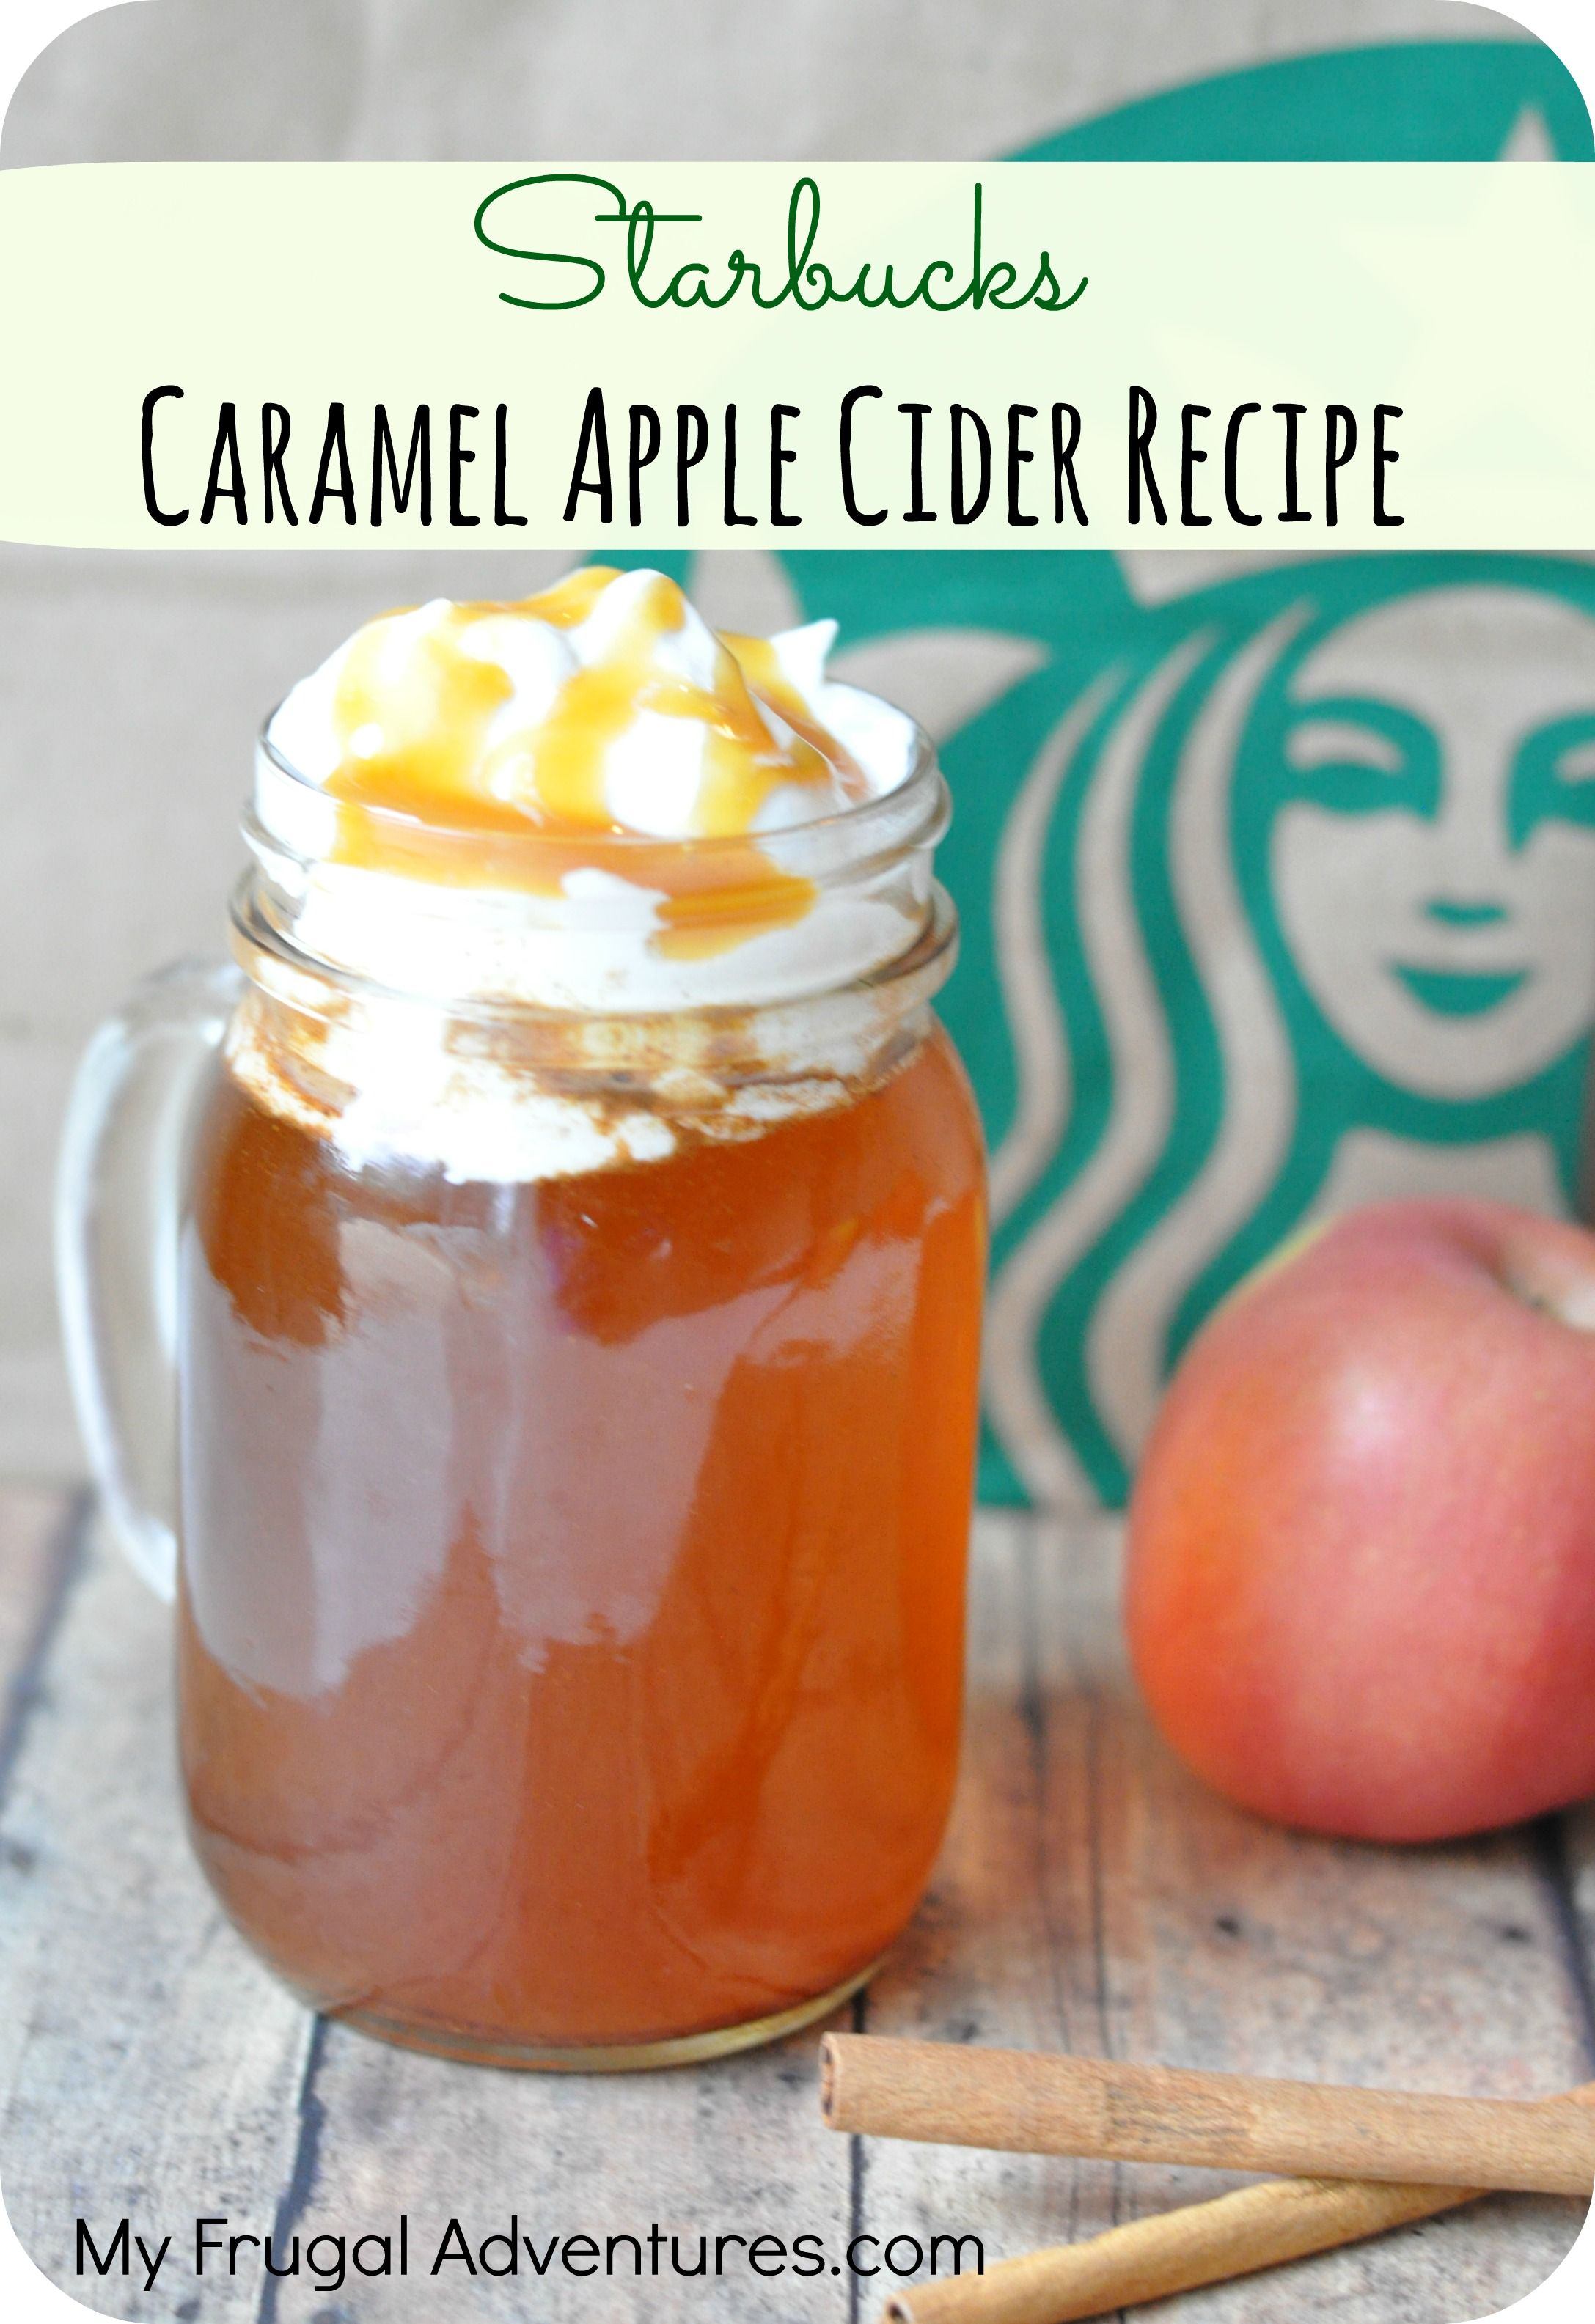 Homemade starbucks caramel apple cider recipe my frugal